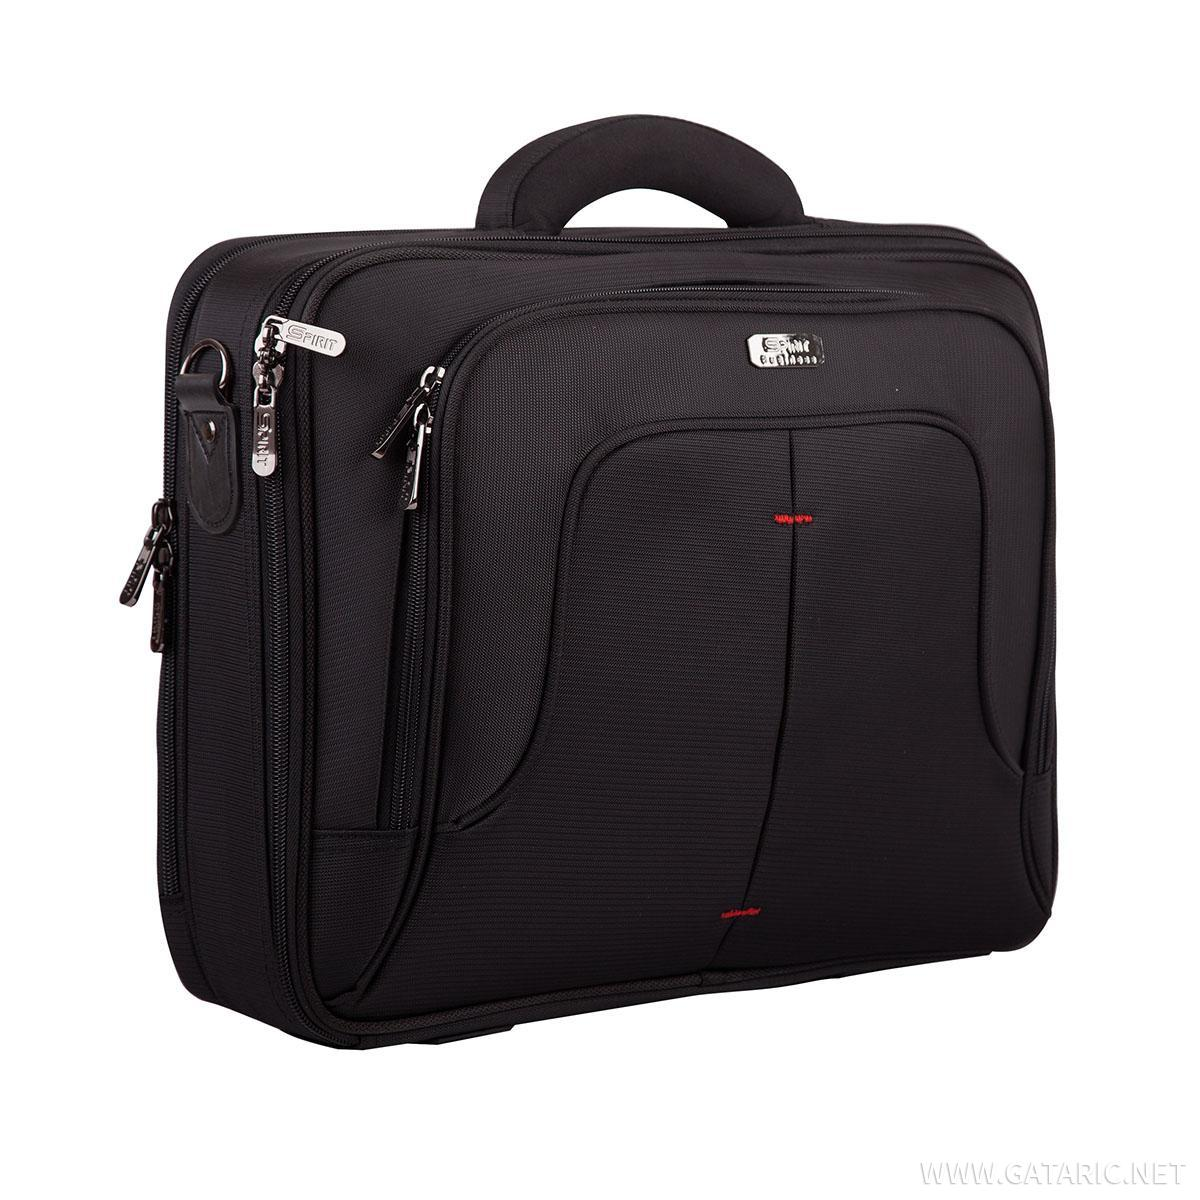 Poslovna/Laptop torba, XL 16''